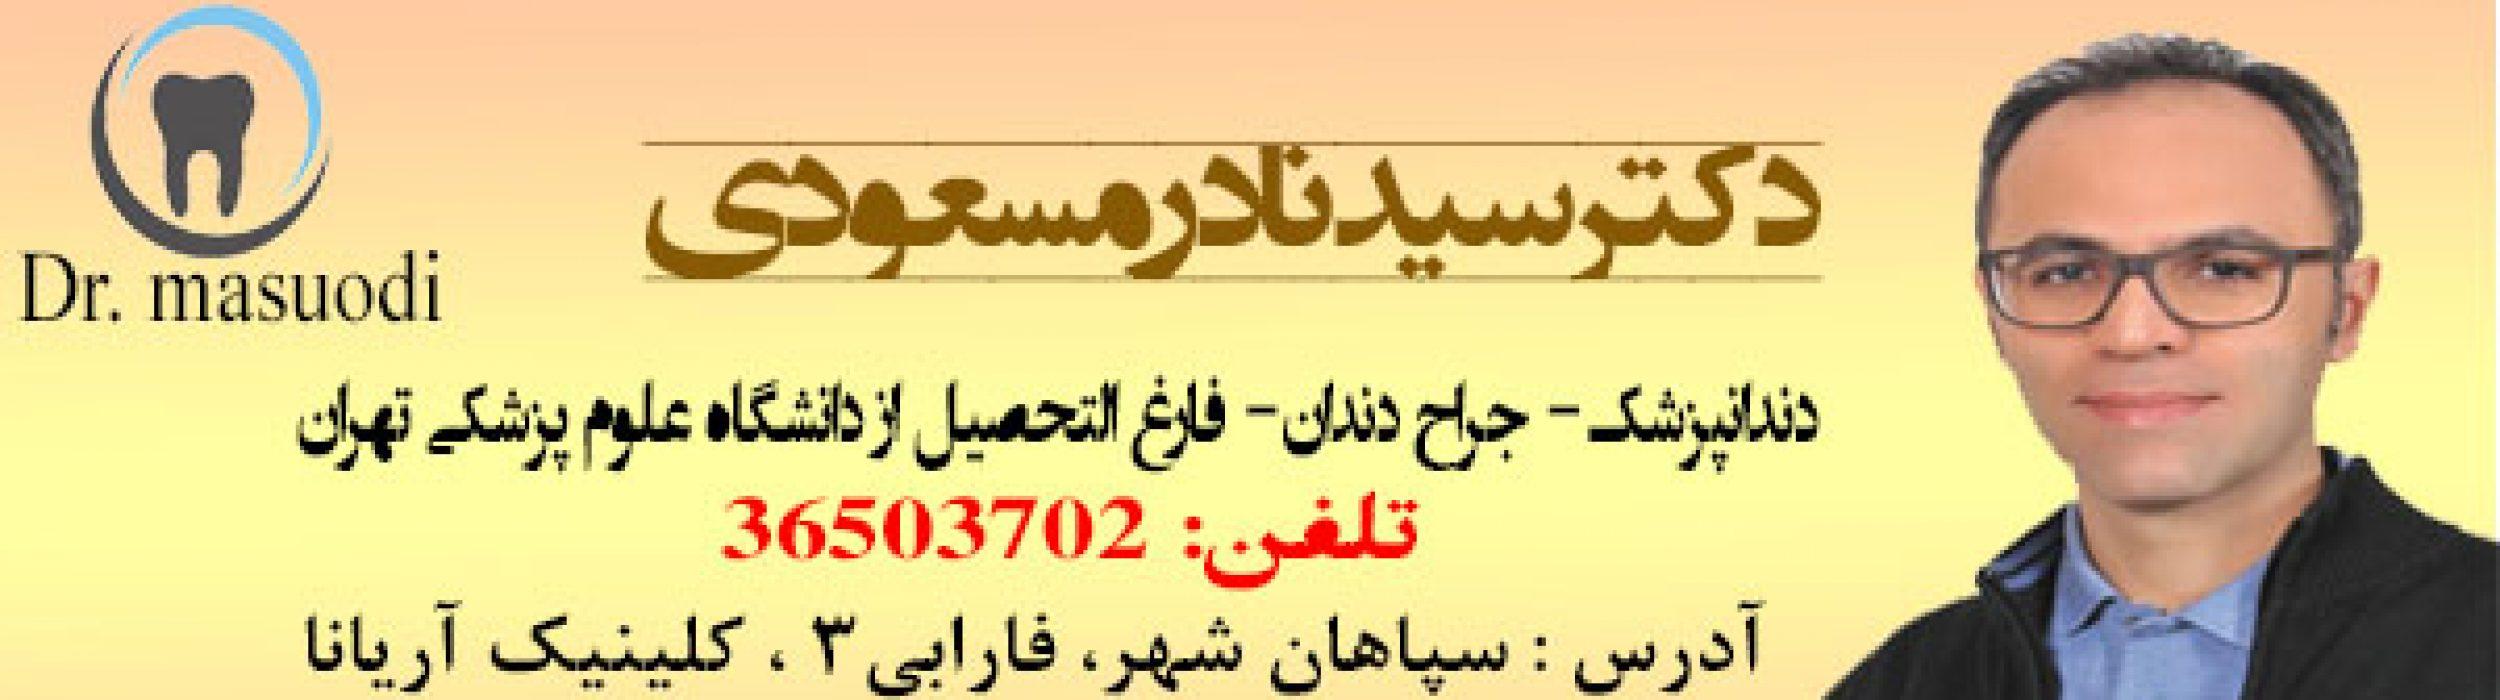 http://www.markaz-pezeshk.ir/wp-content/uploads/2020/05/دکتر-سید-نادر-مسعودی1-2500x700.jpg